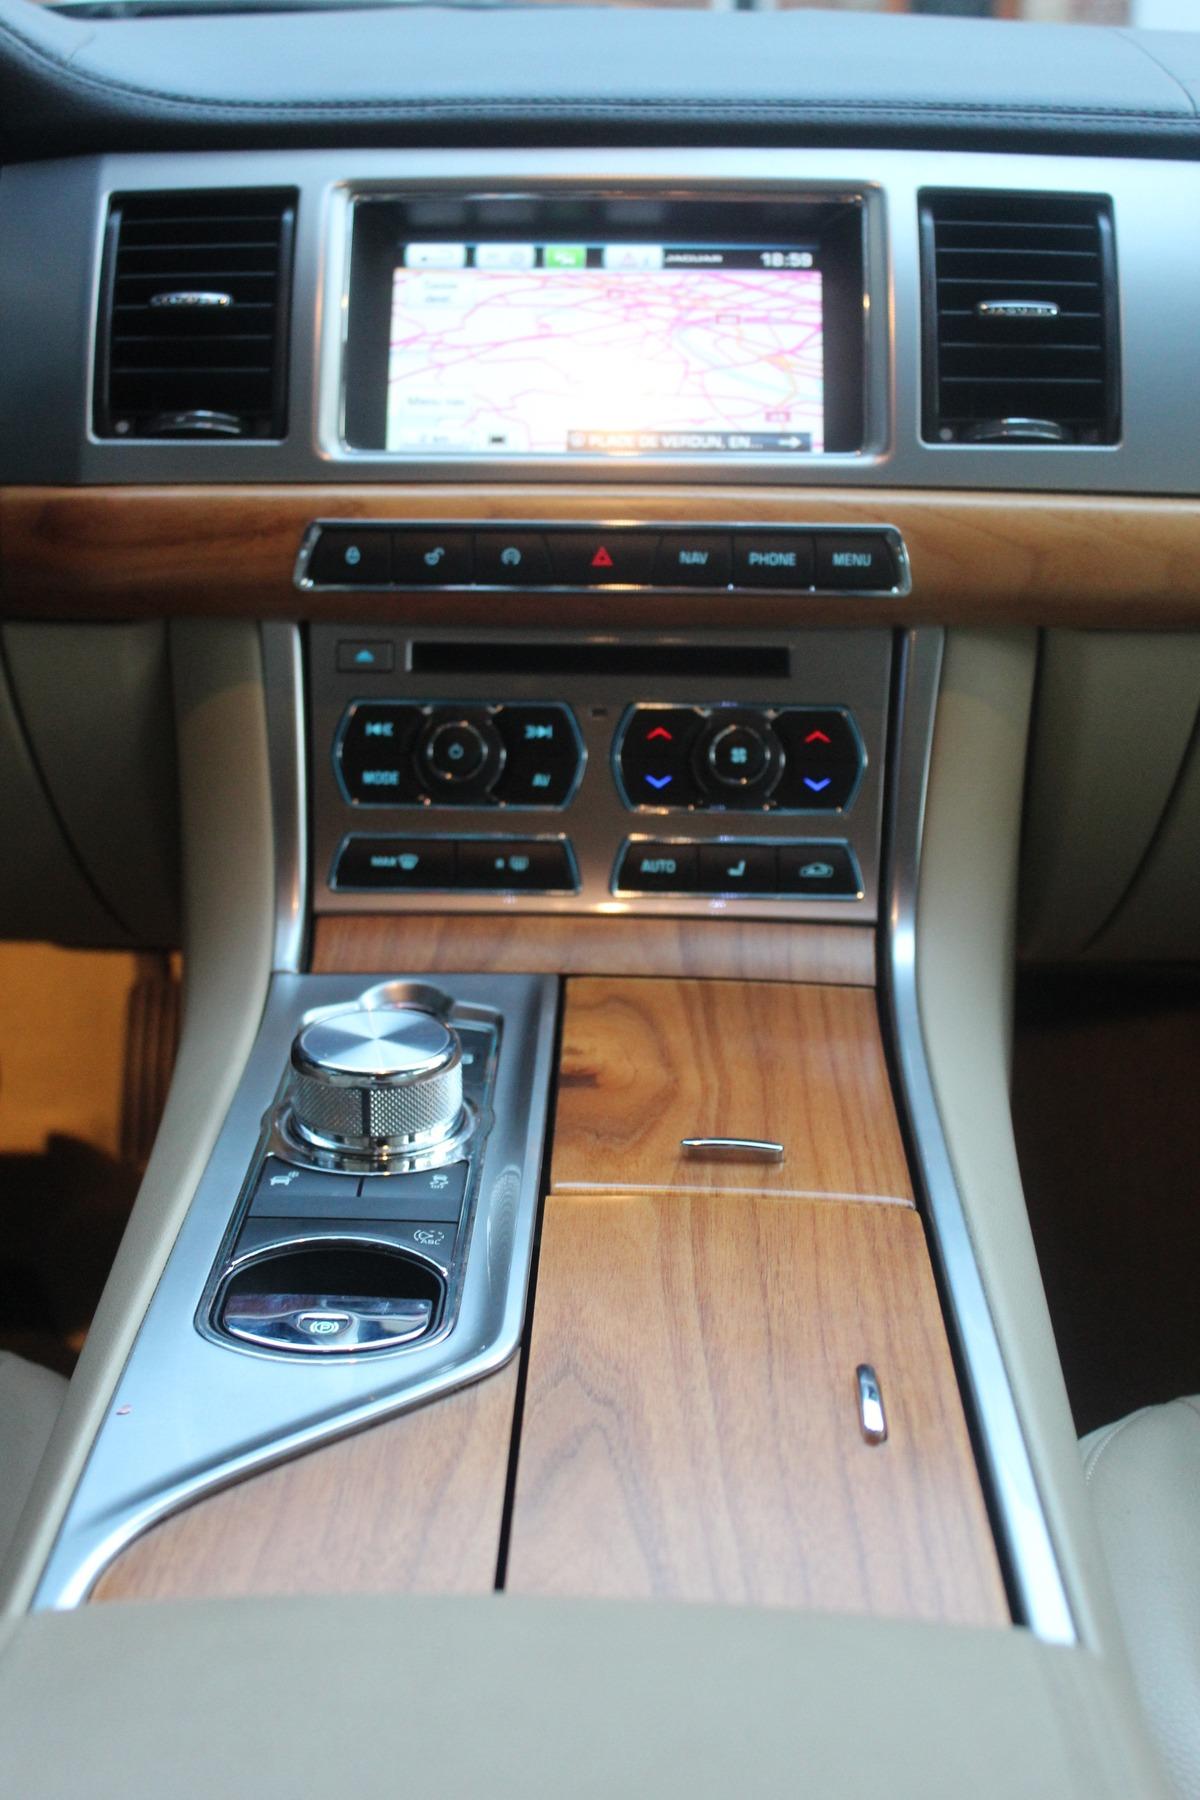 Jaguar Xf 2.2 D 163 BRITISH EDITION